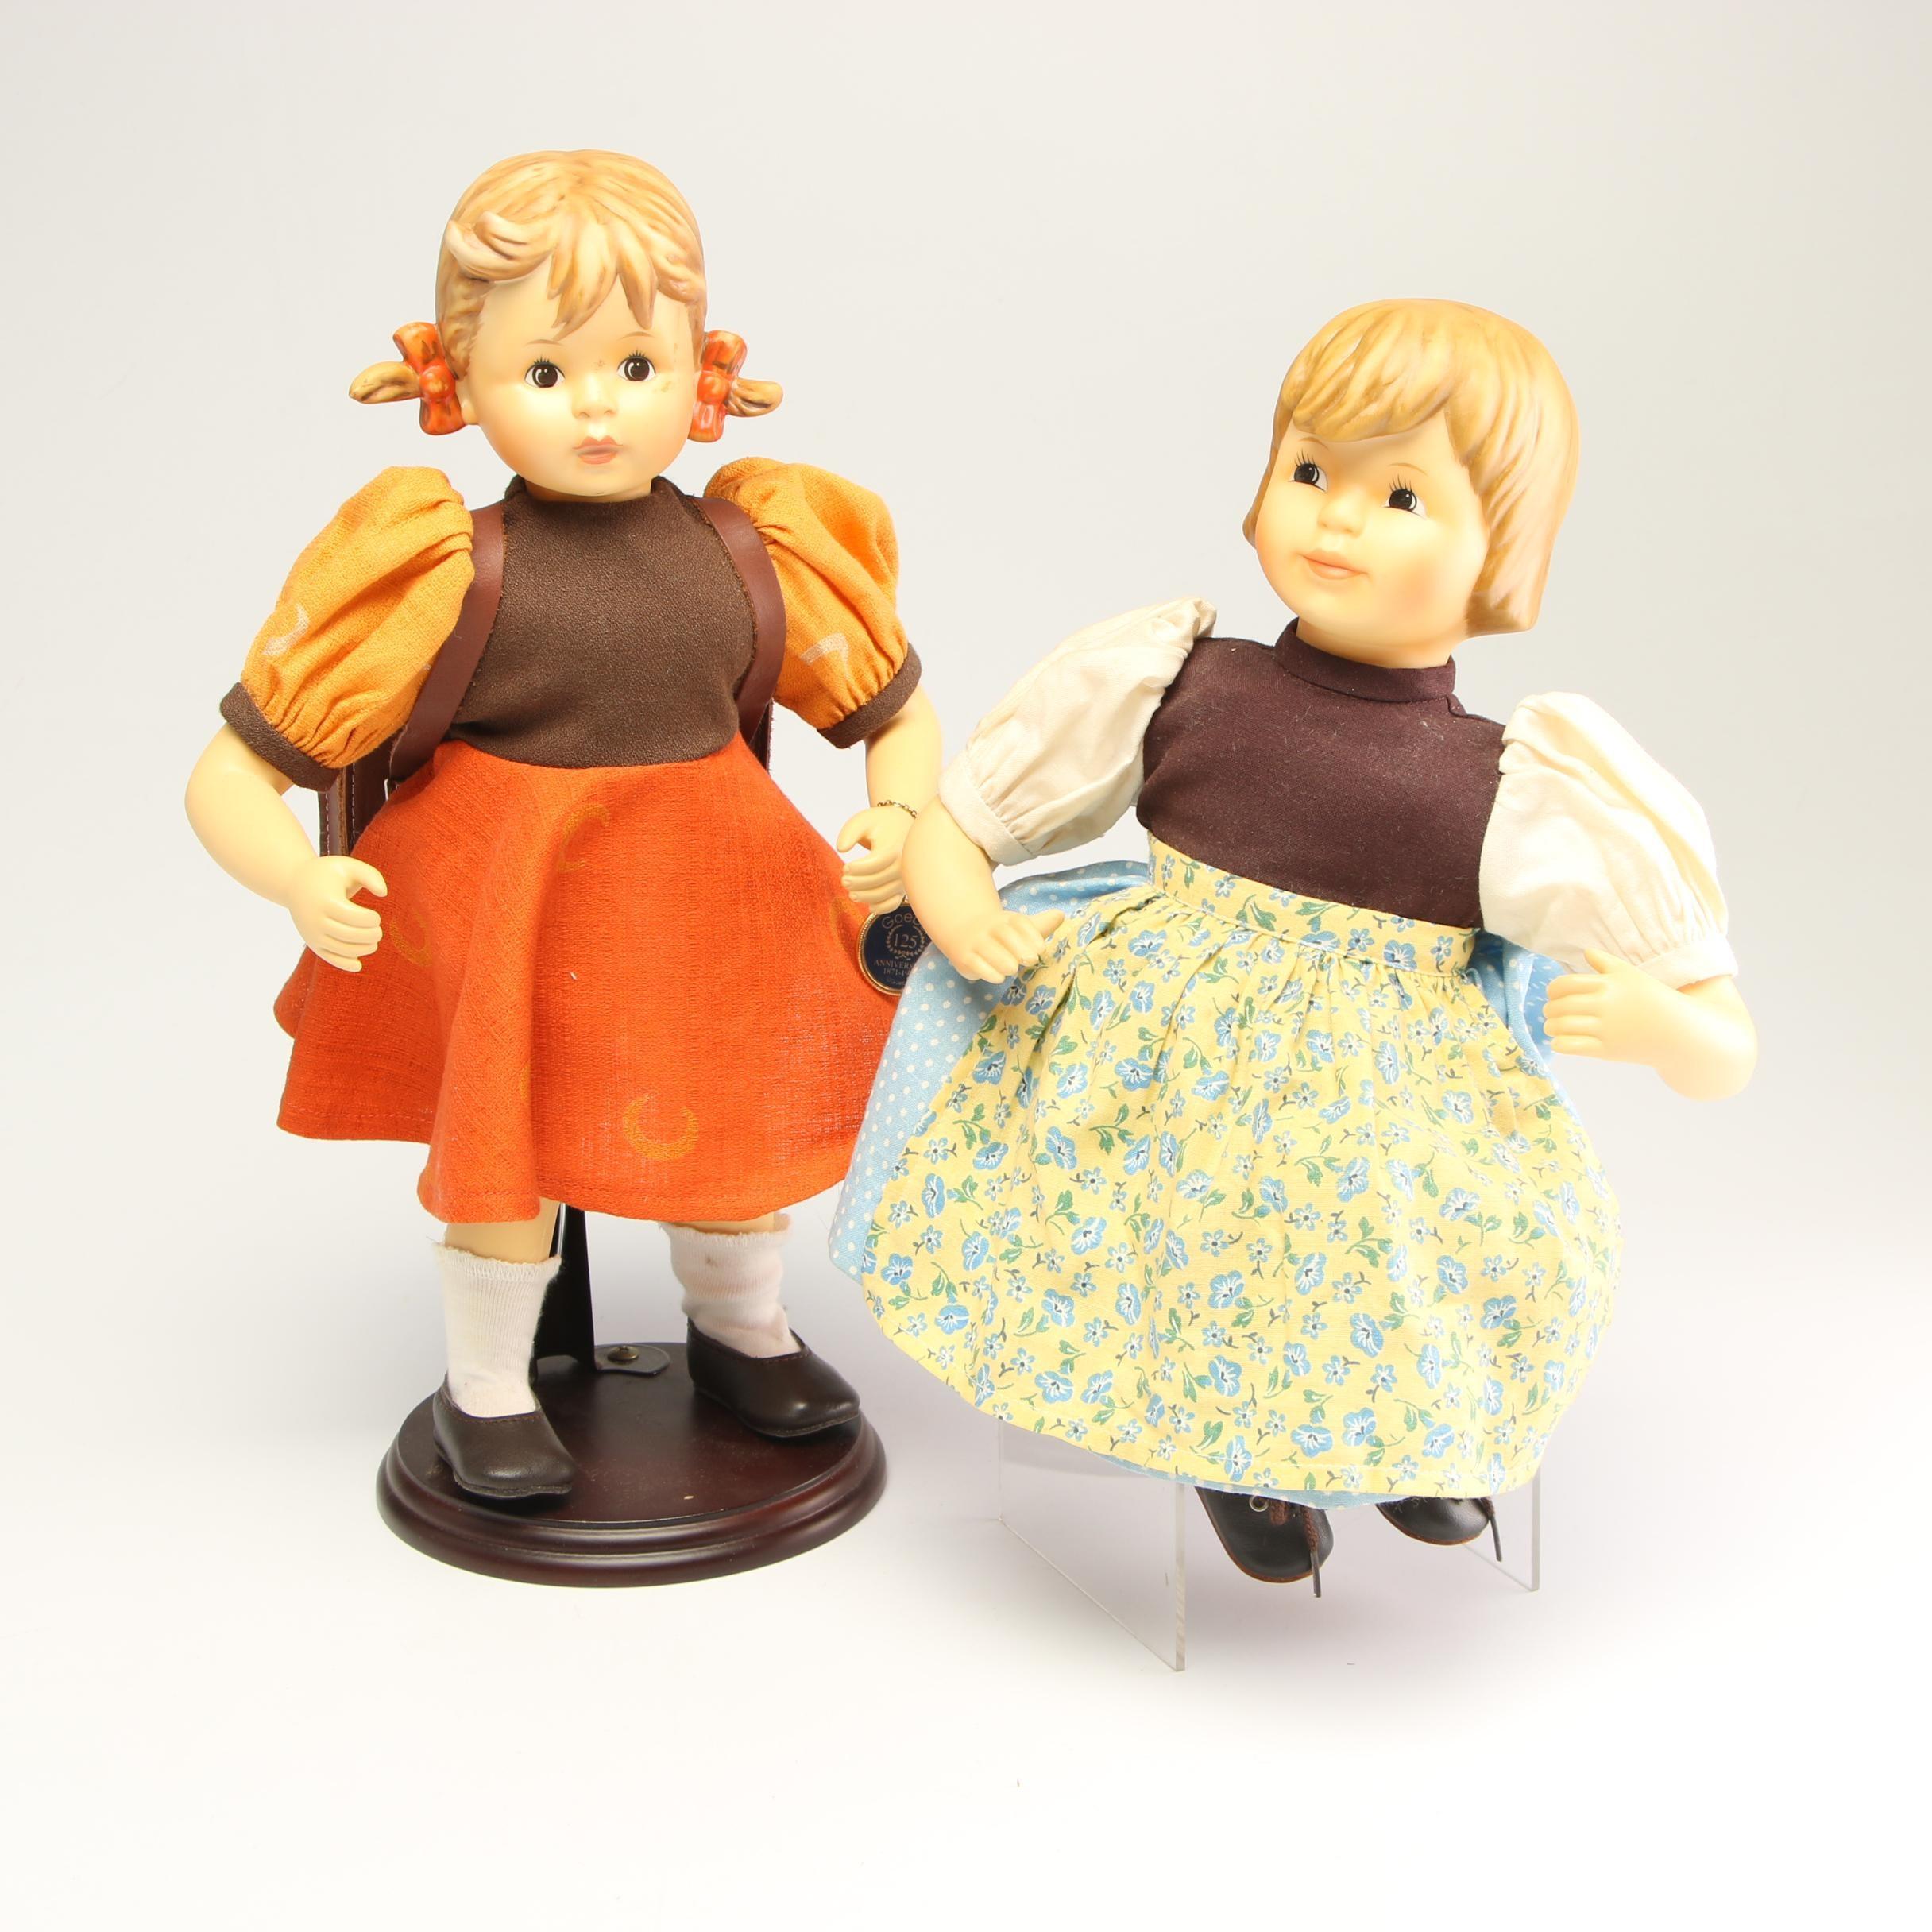 Goebel Porcelain Dolls Including 125th Anniversary Schoolgirl Doll